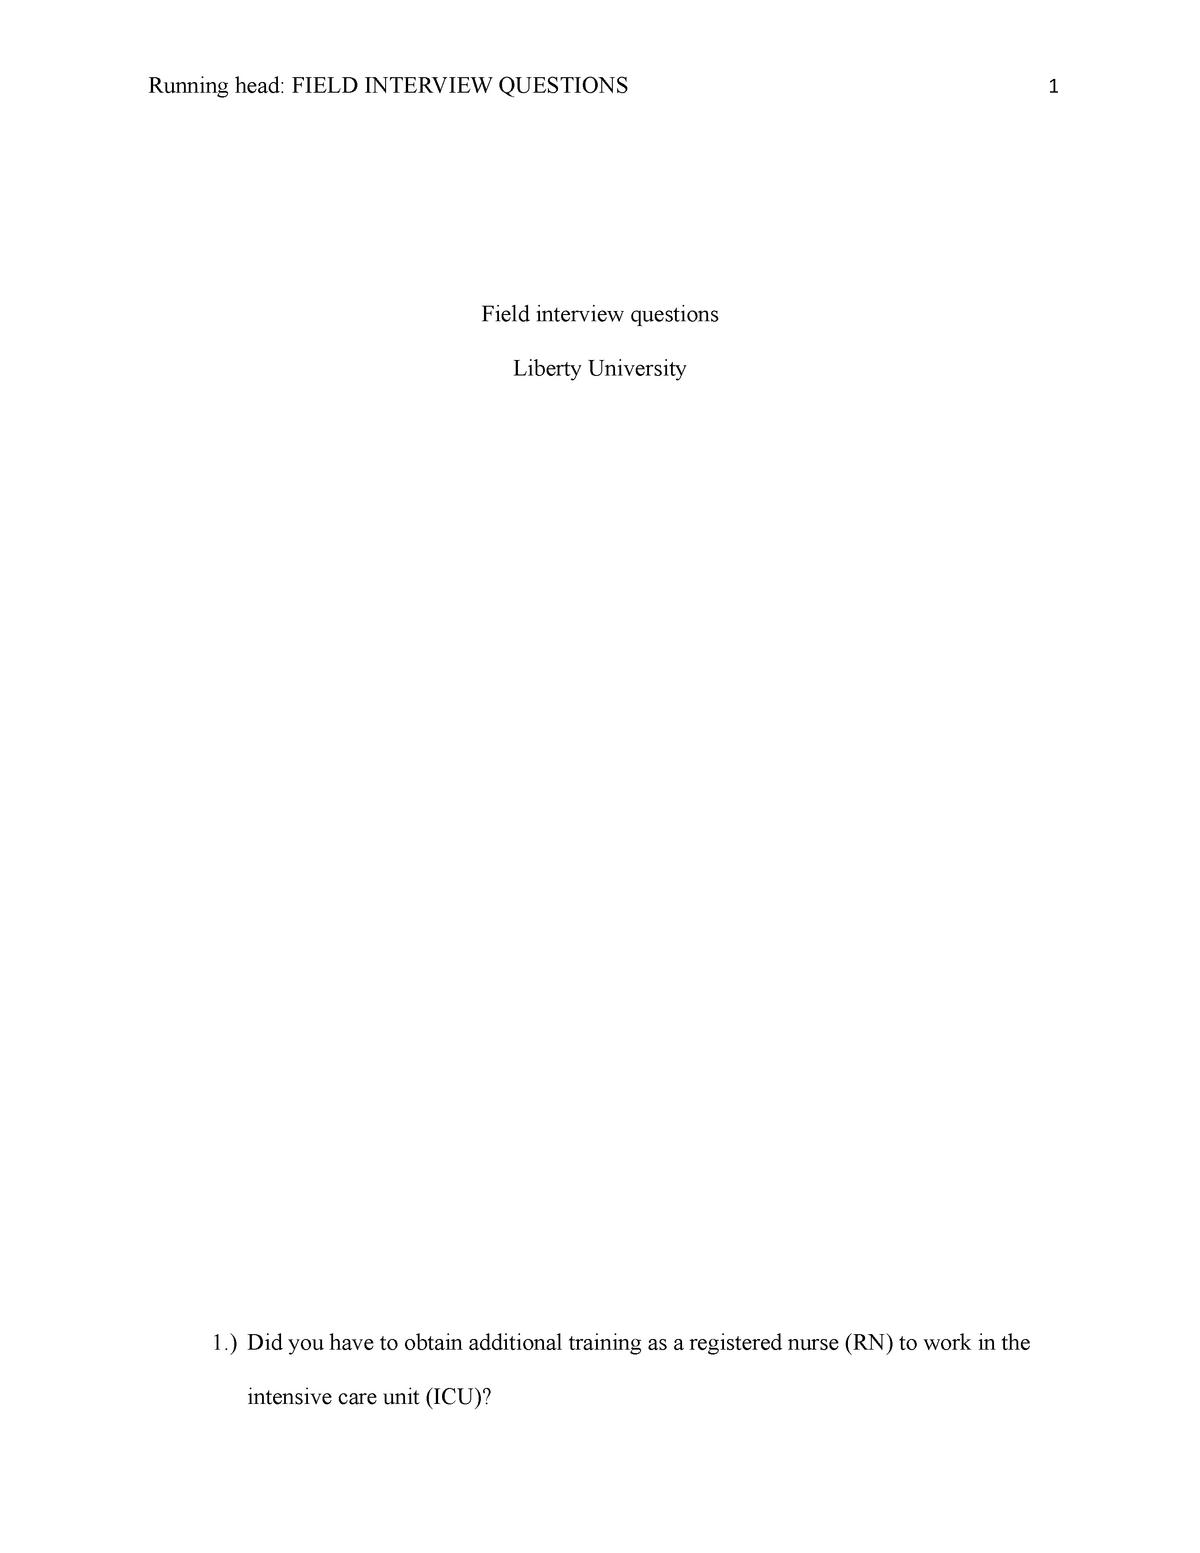 CRIS 606 Field interview questions - CRIS 606 - LU - StuDocu